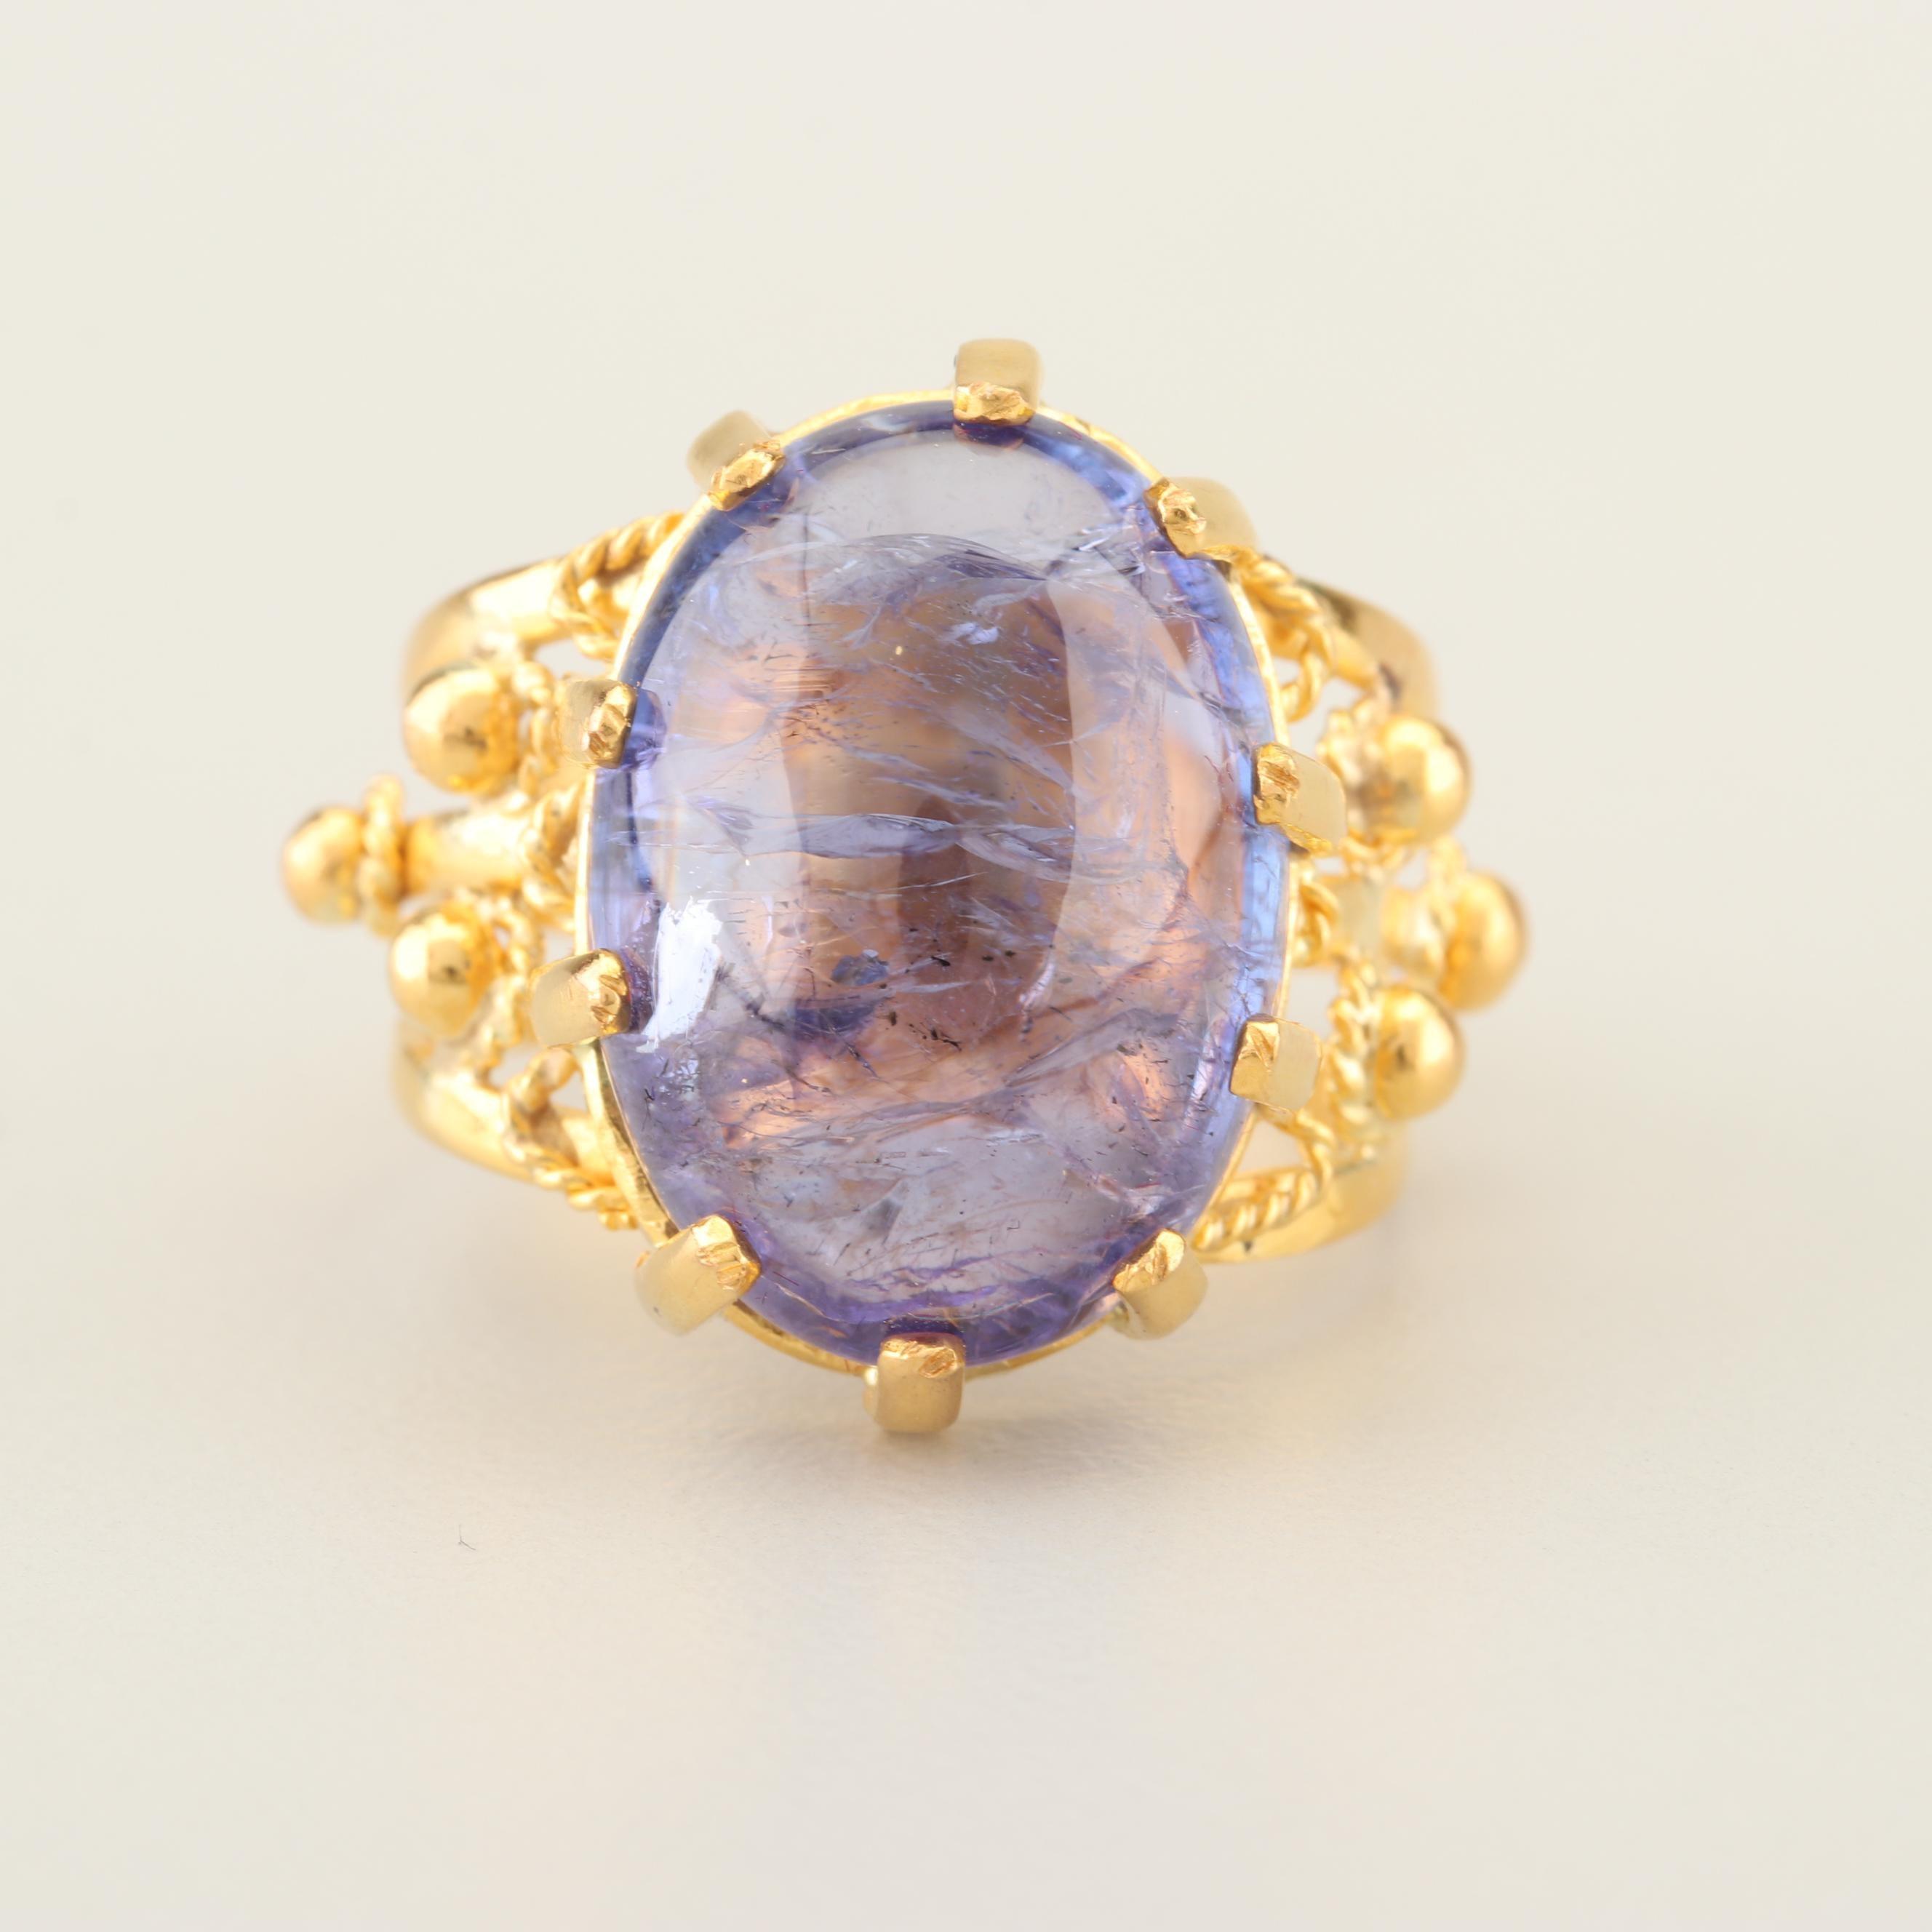 22K Yellow Gold and Tanzanite Ring